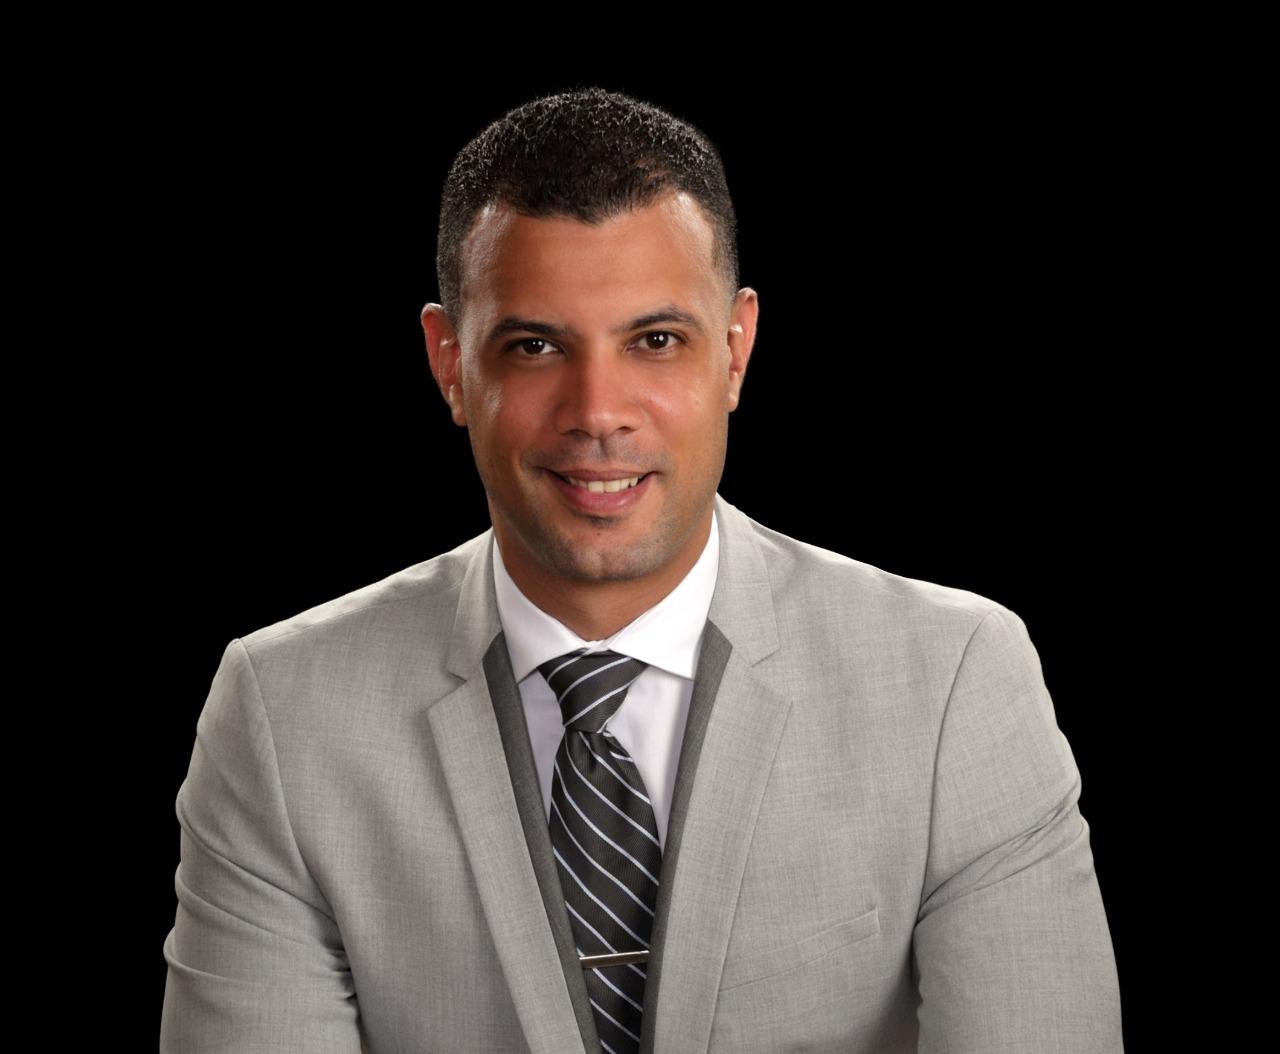 Cemex designa a Rafael Villalona como director en los Emiratos Árabes